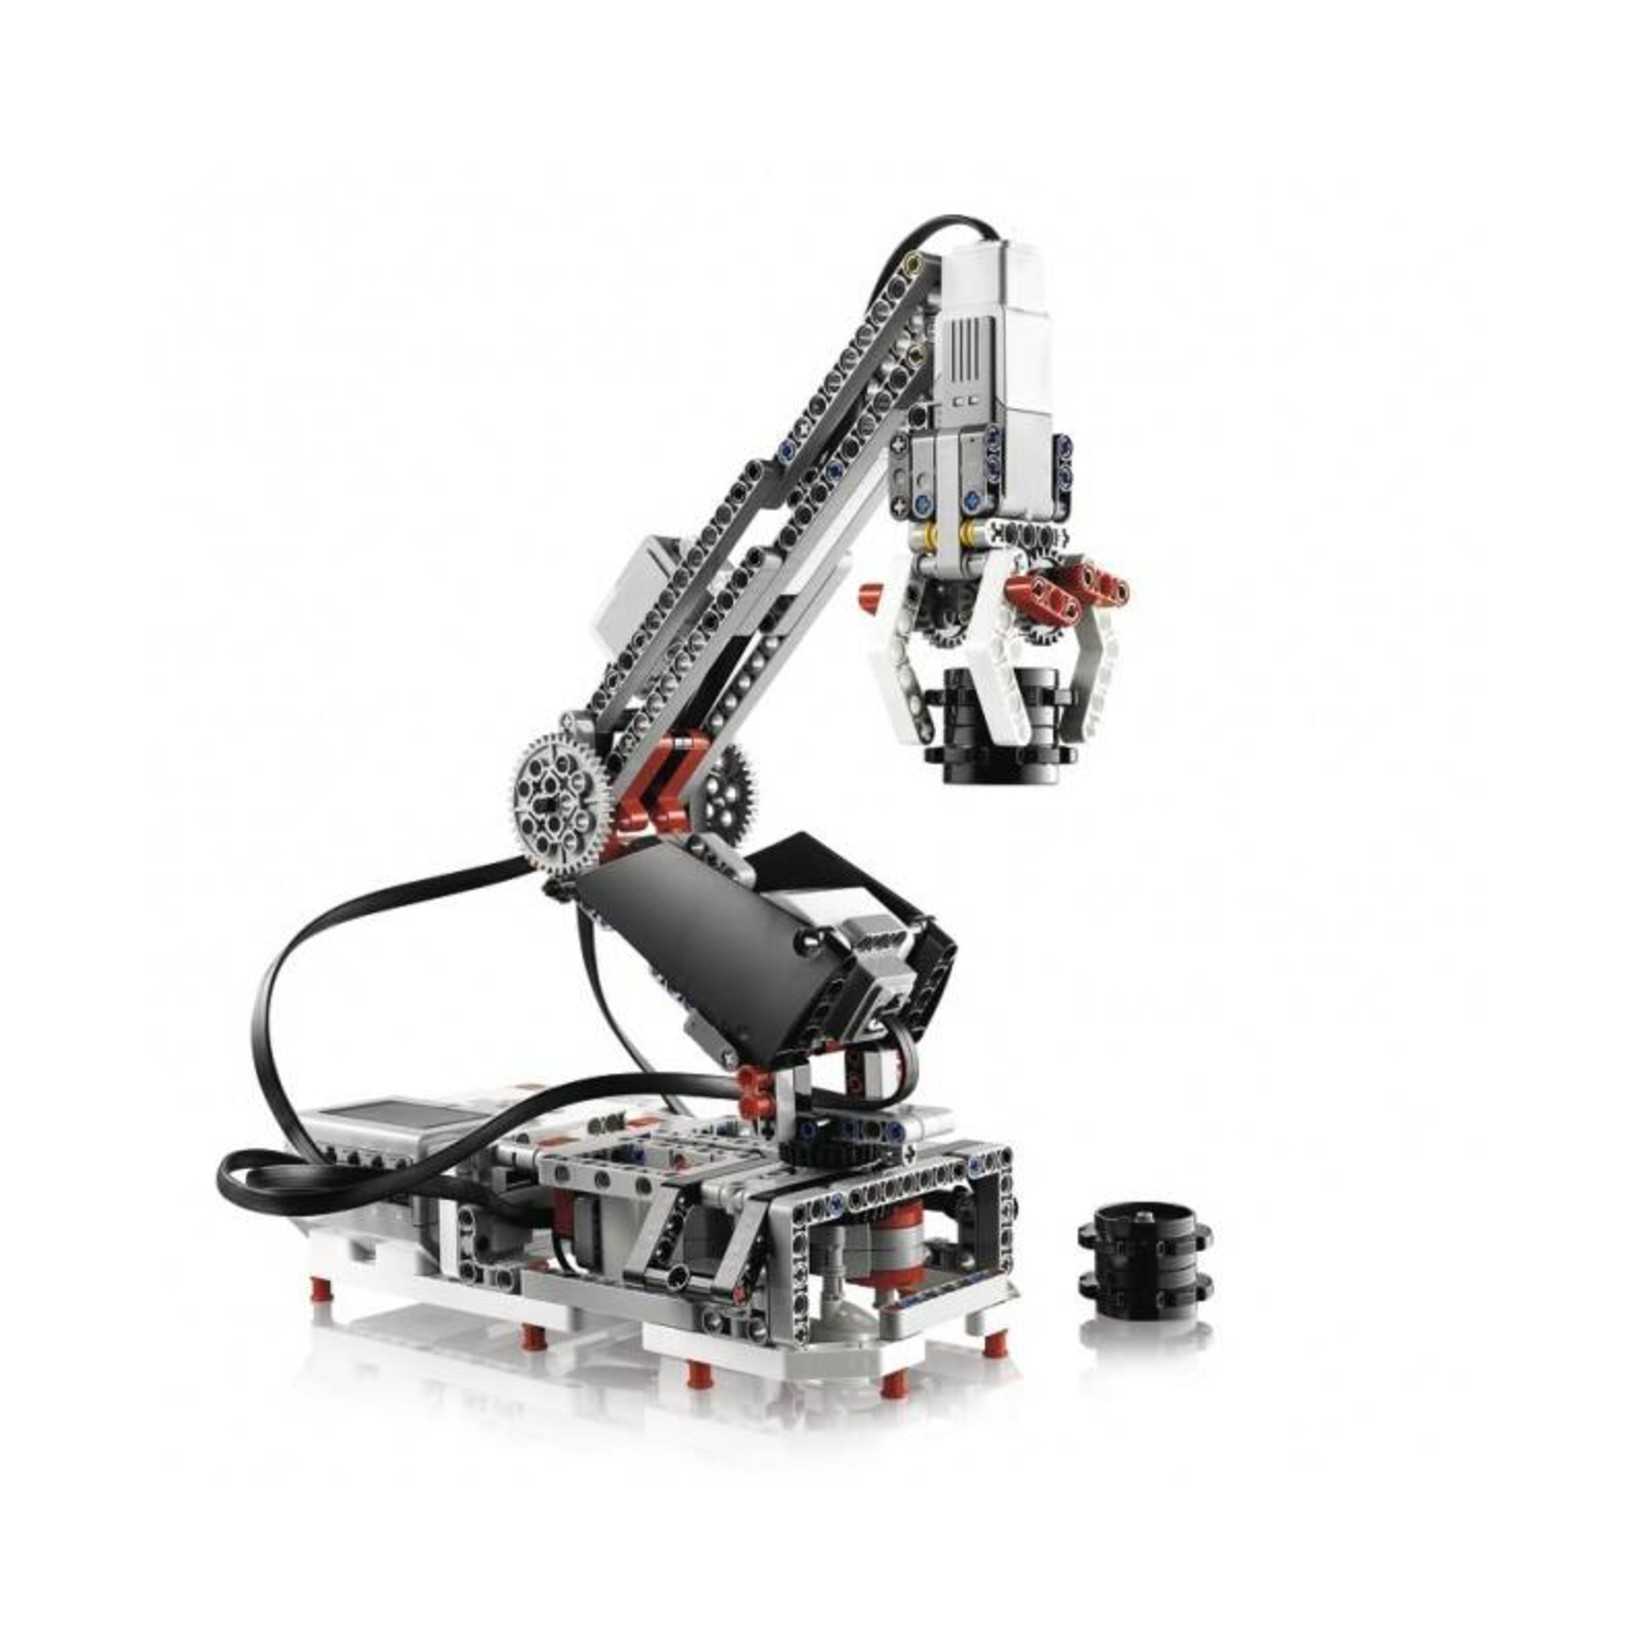 LEGO® Education EV3 Educatieve Basis set inclusief software